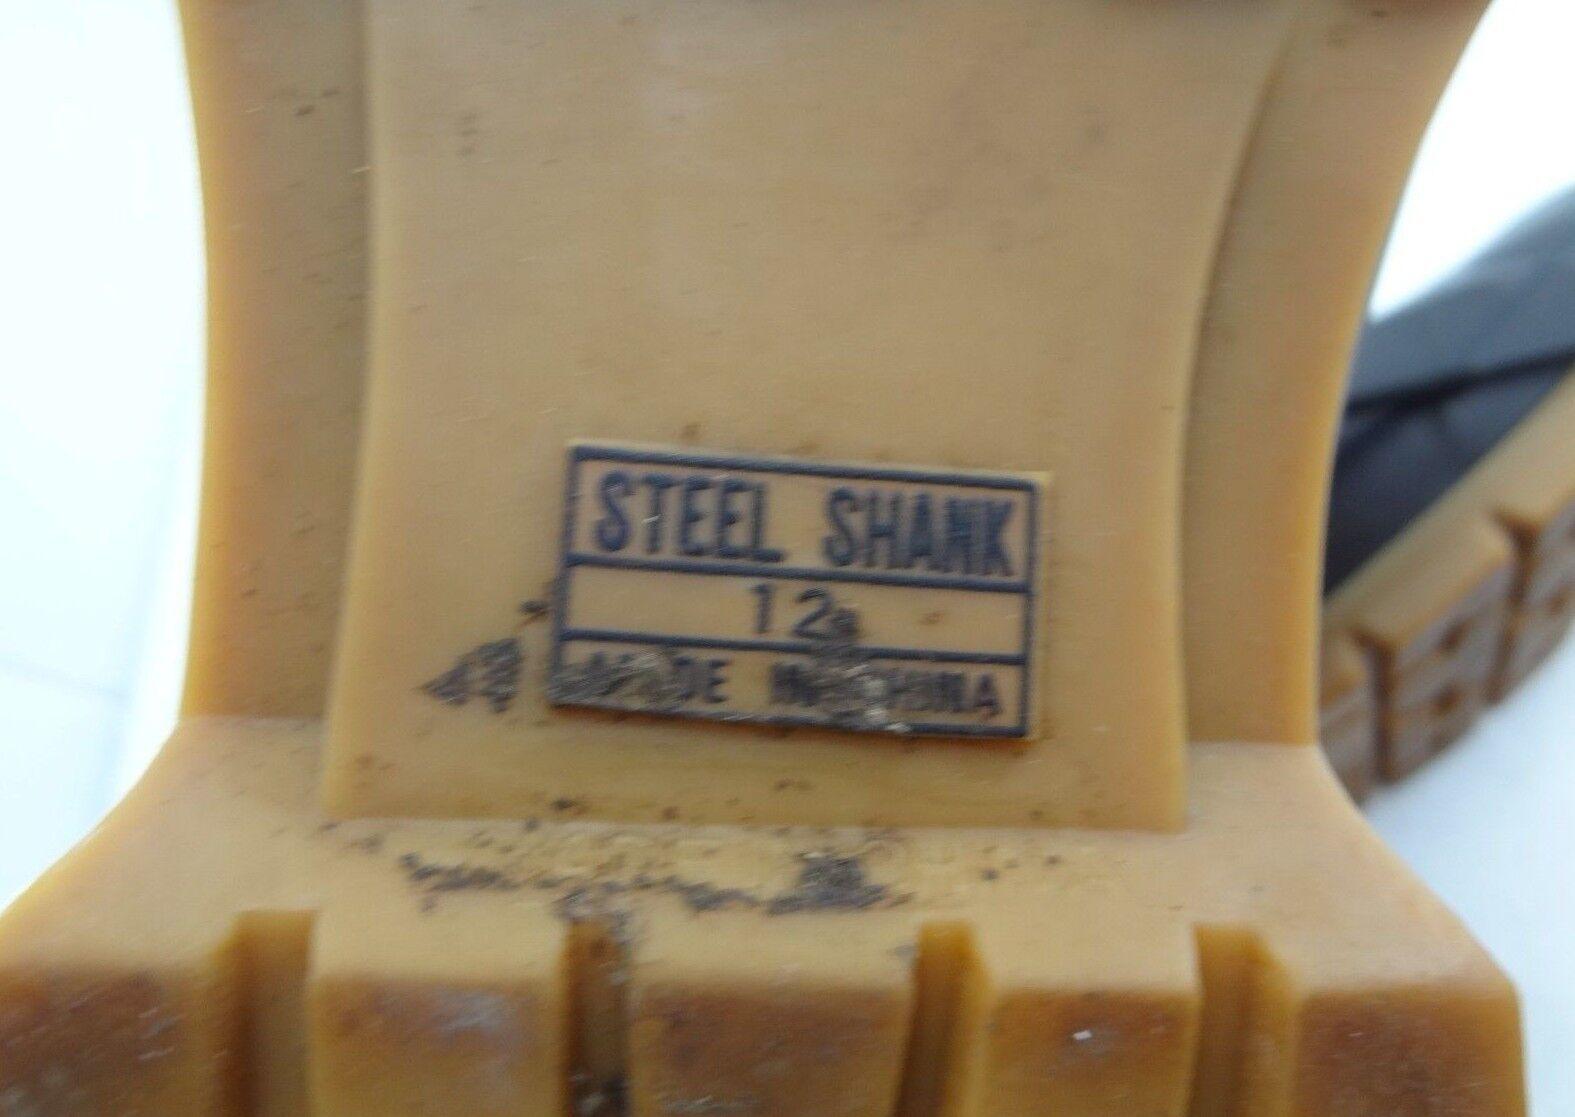 Khombu  Herren 12 Steel M Juno Braun Duck Stiefel Steel 12 Shank eae094